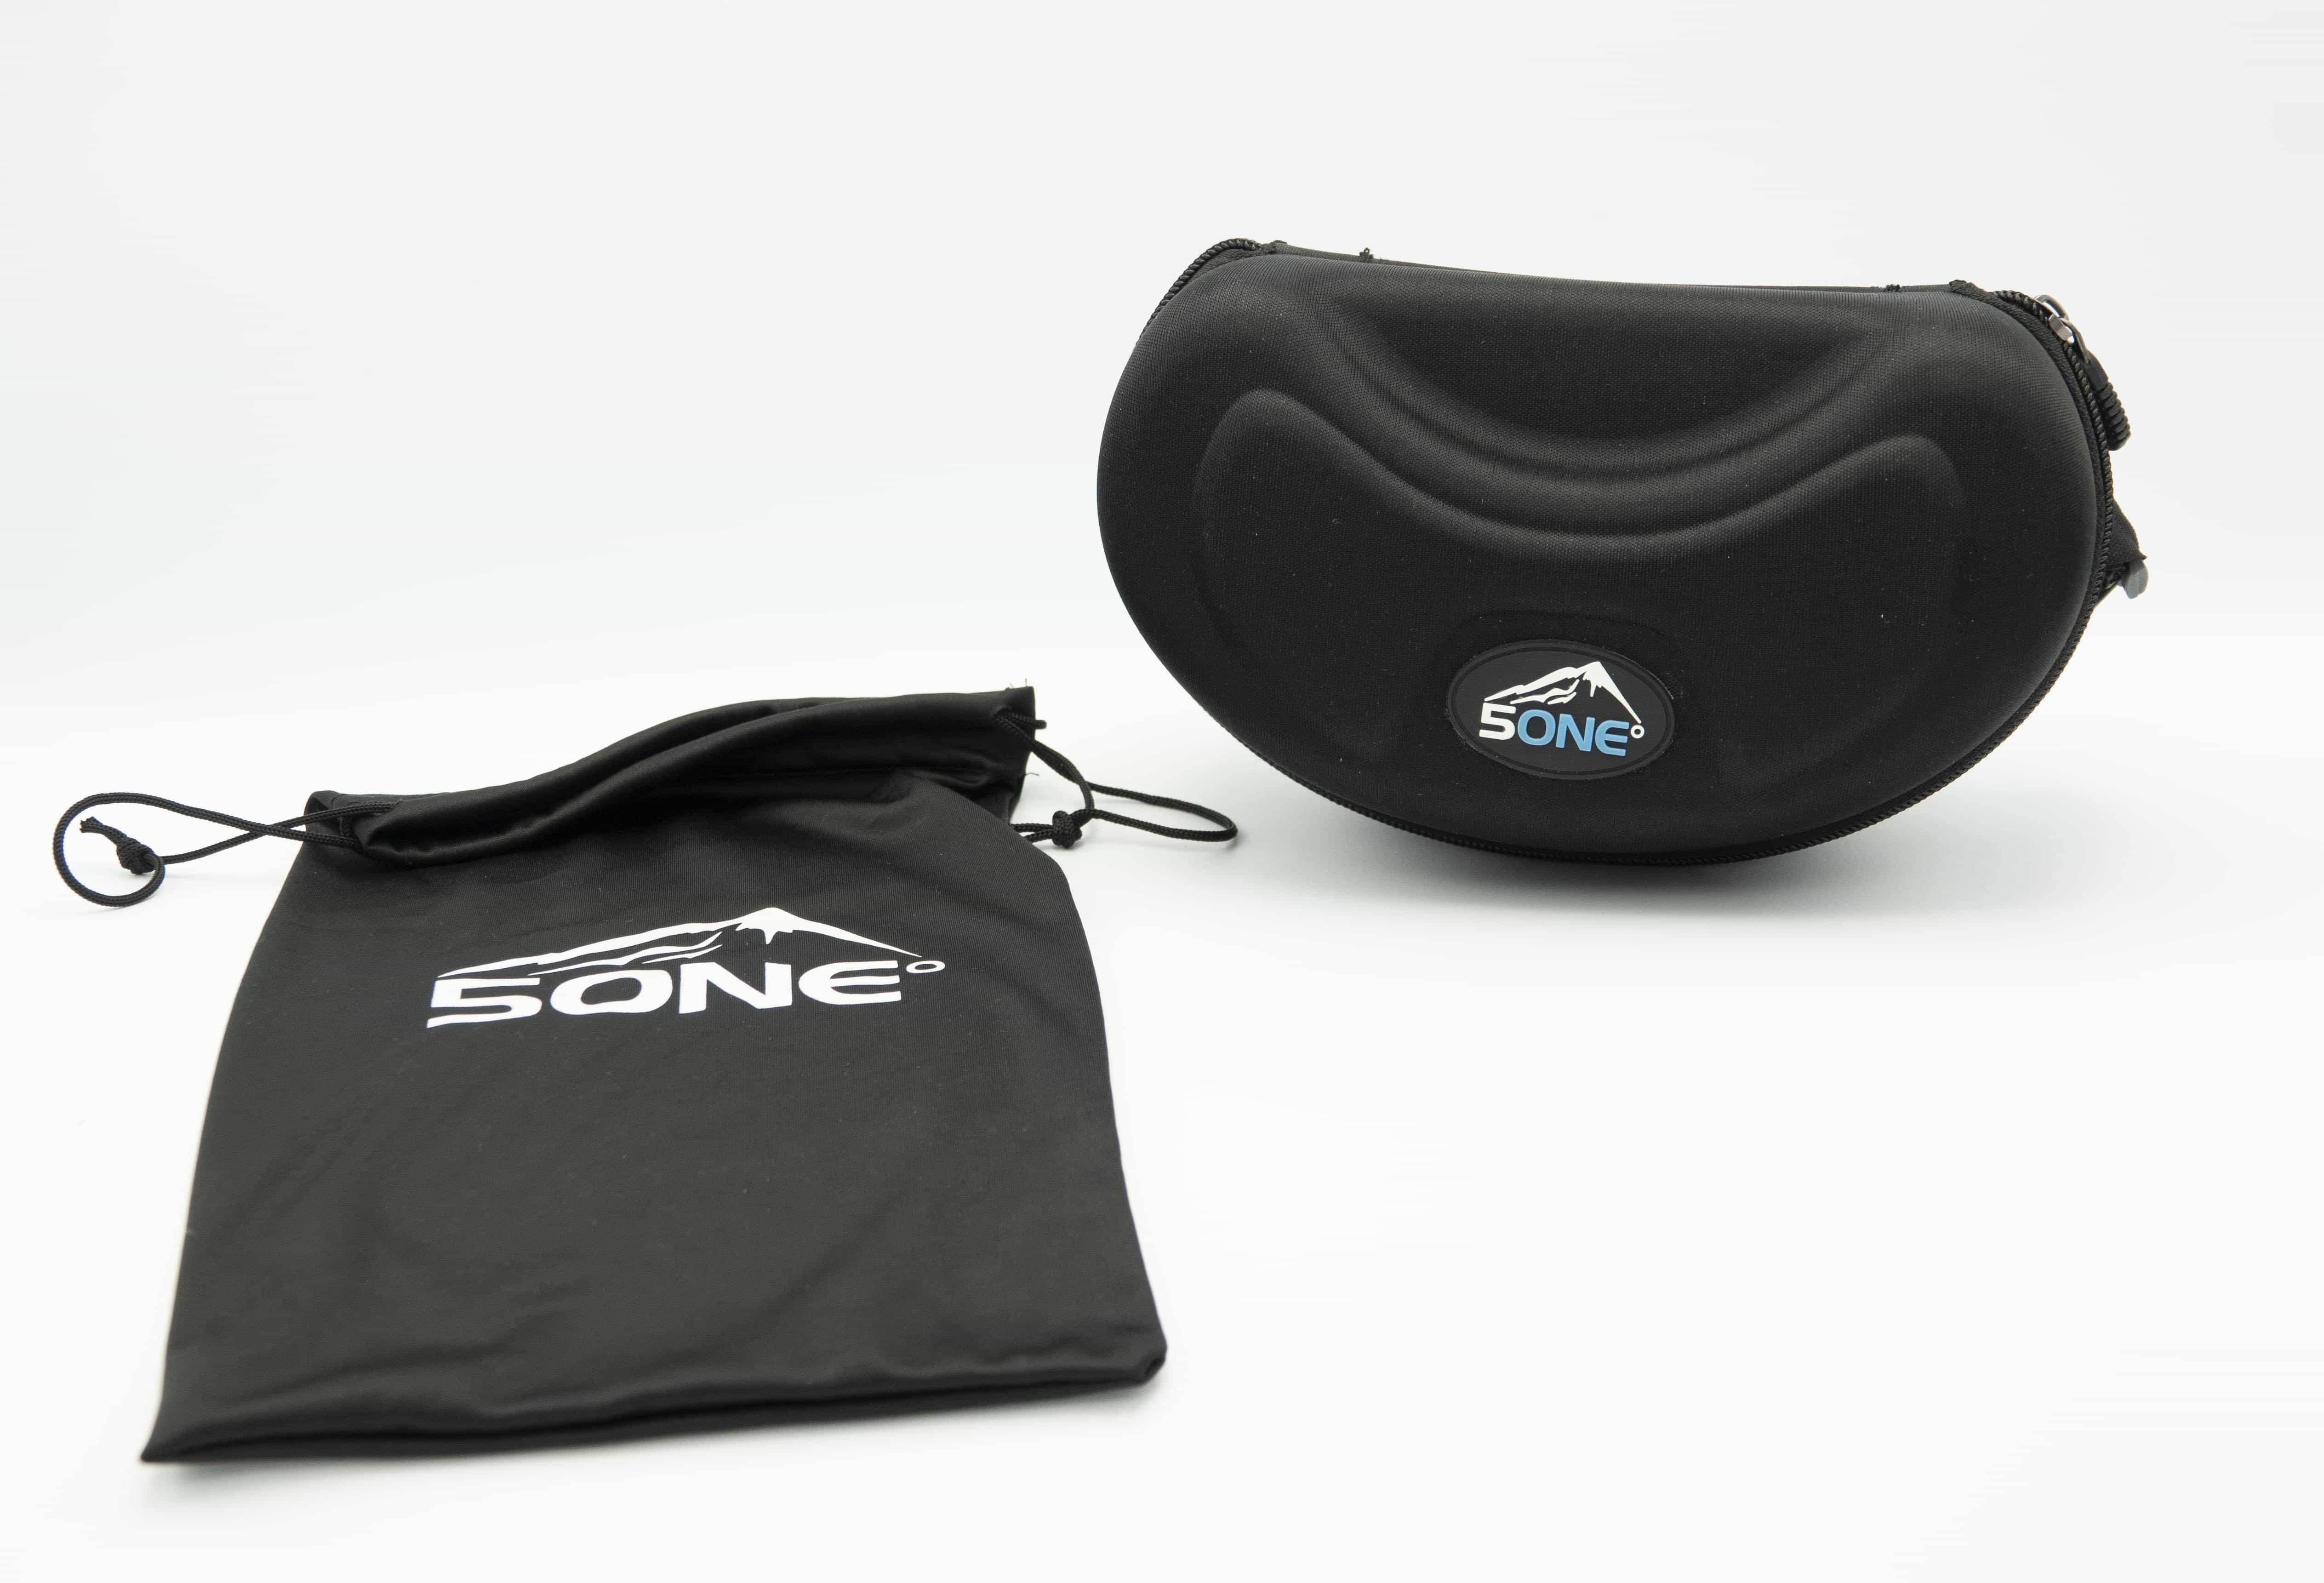 5one® Alpine 7 - skibril - 2 verwisselbare lenzen - Oranje en Blauw